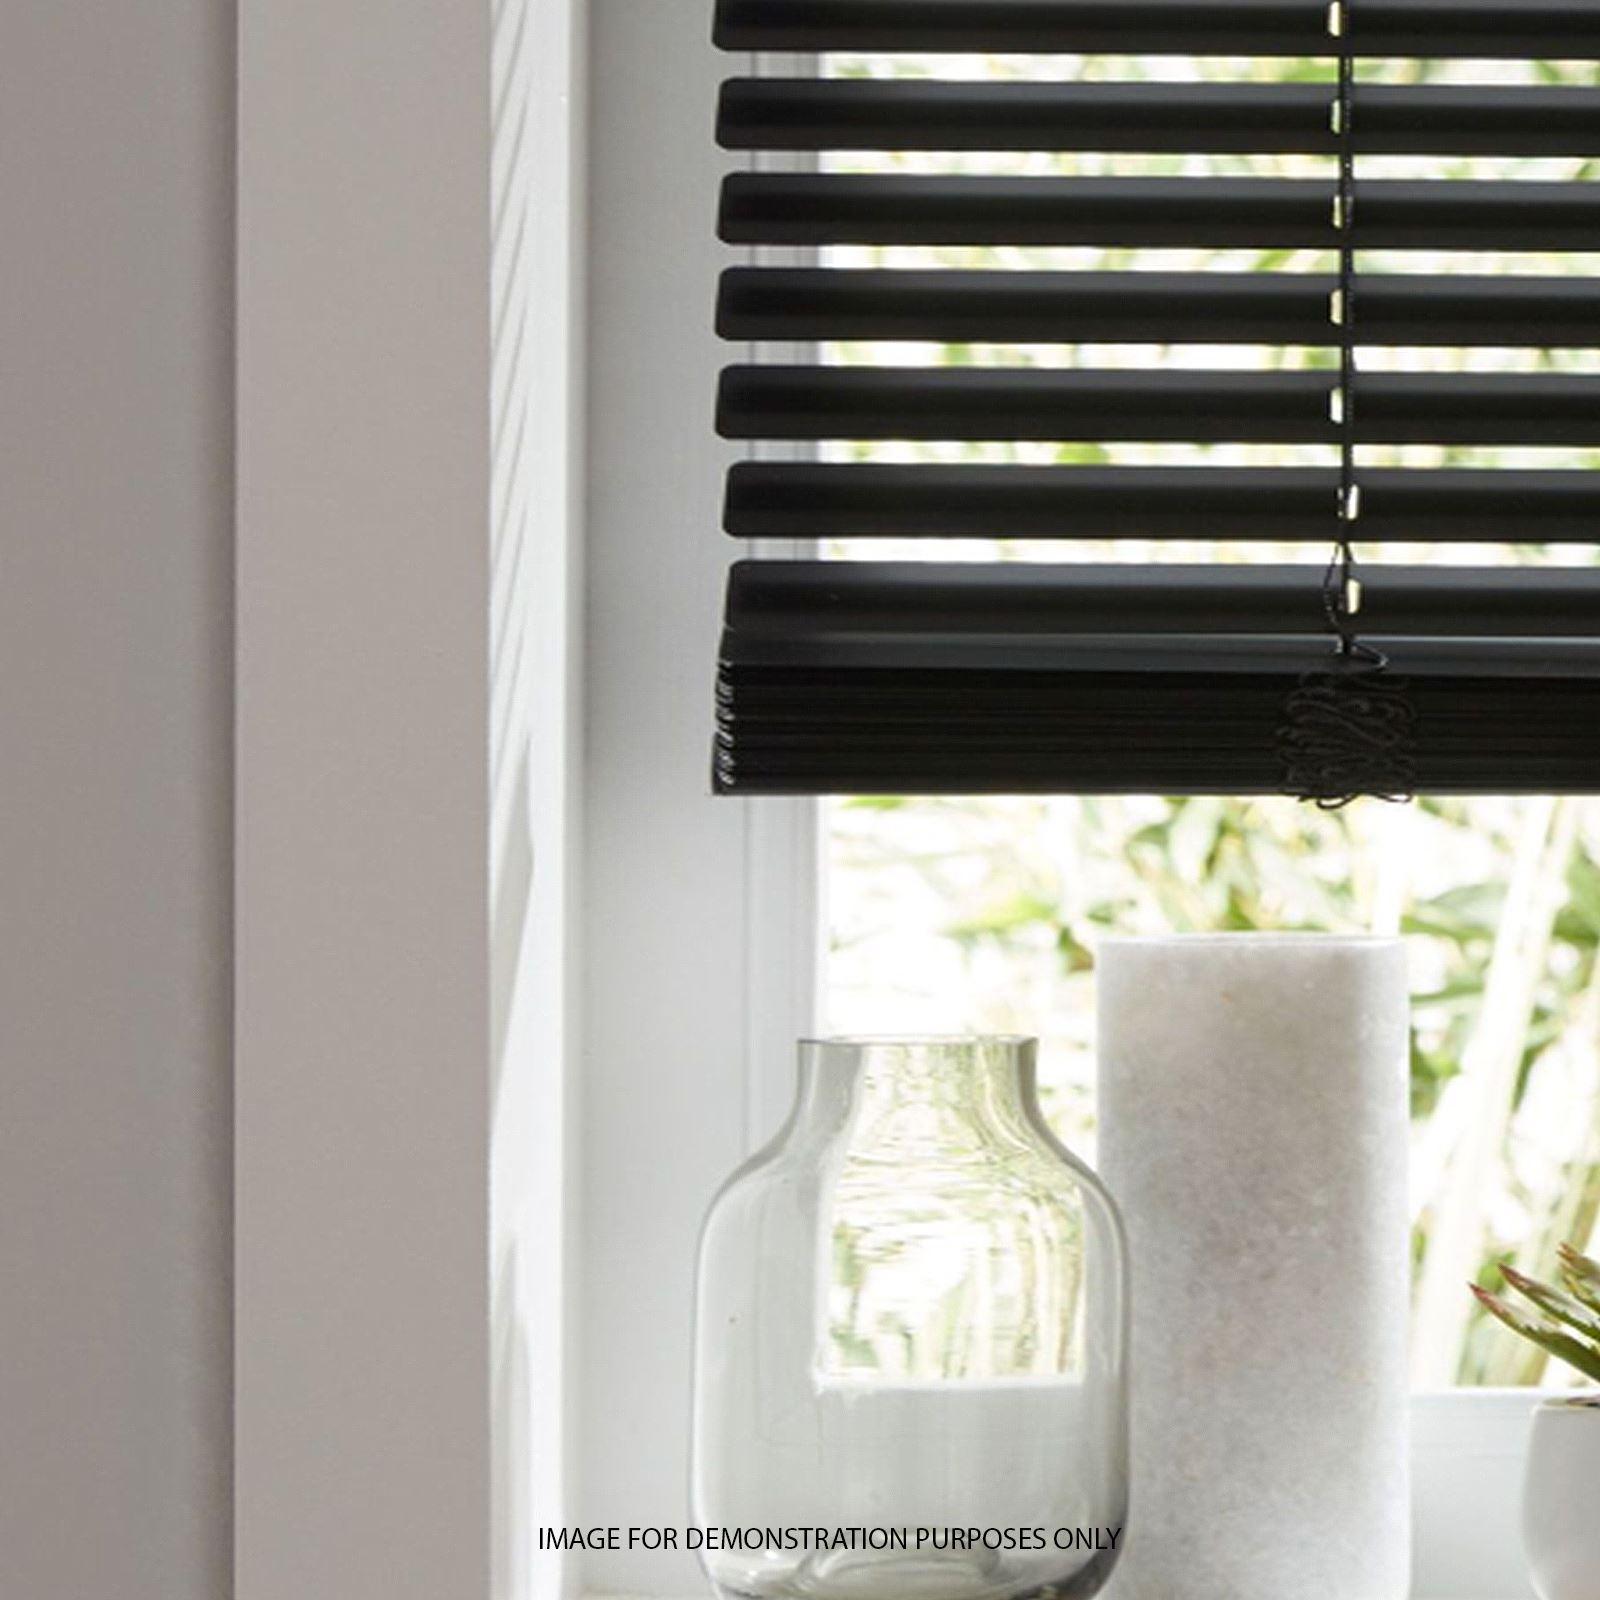 Details About Pvc Venetian Blinds Window Blind In Black Cream White Or Wooden Grain Effect Uk